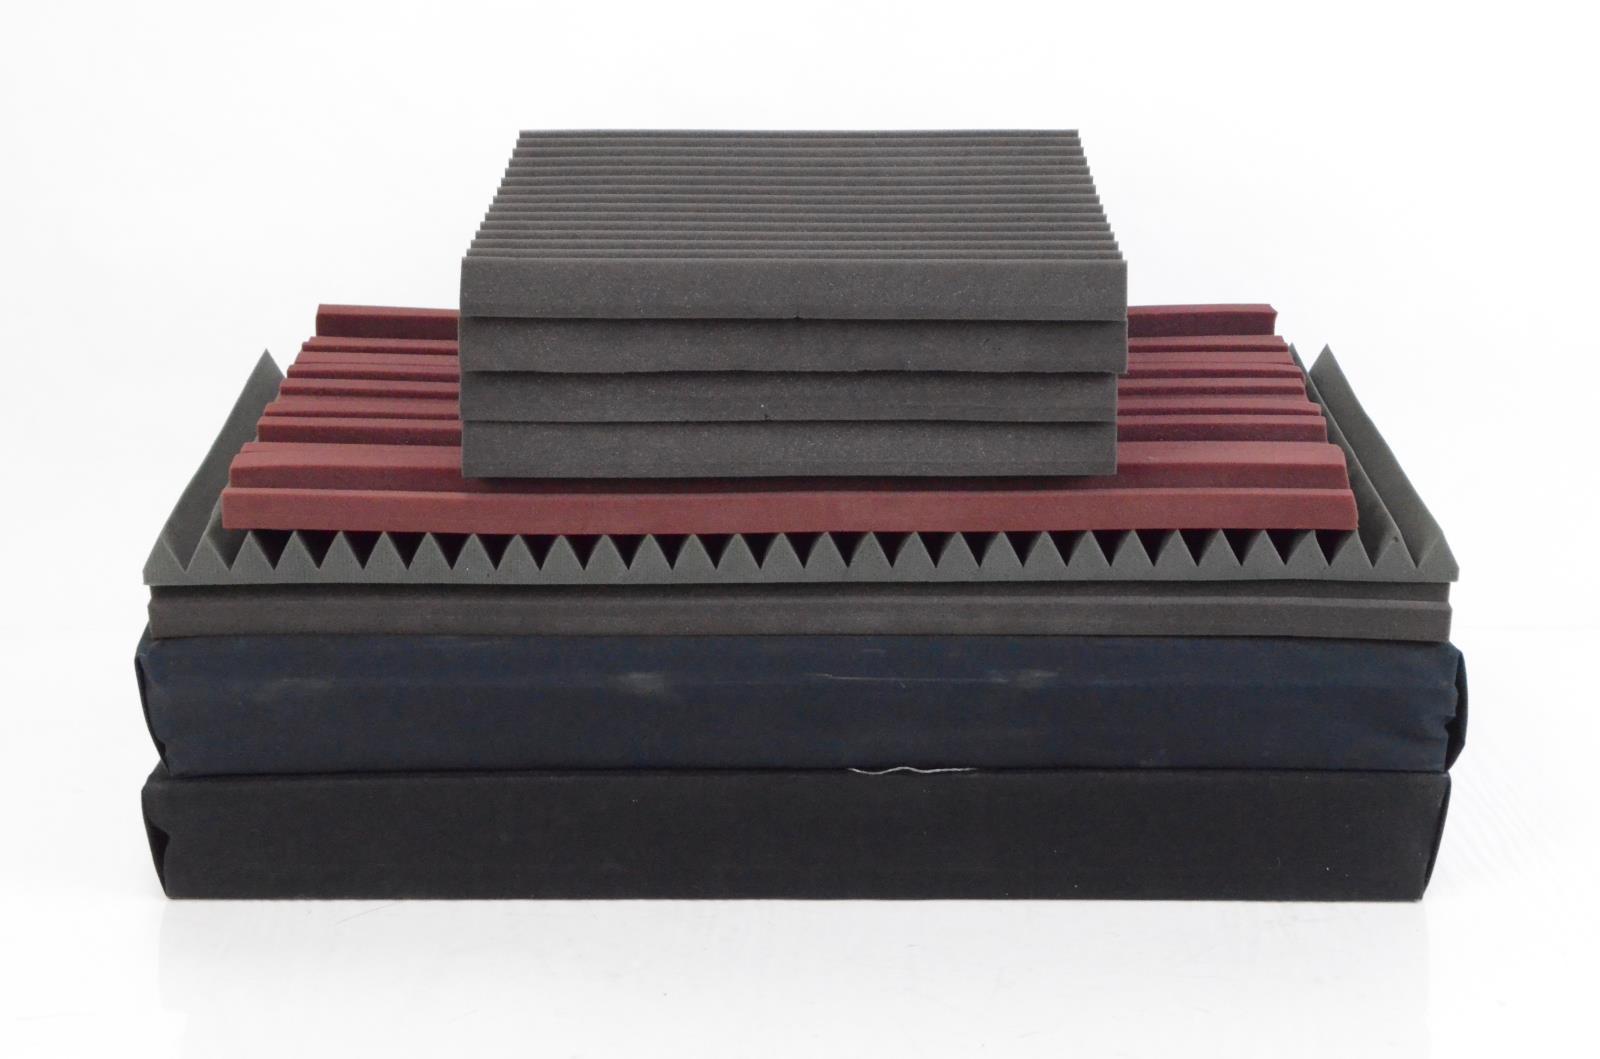 9 Auralex Studiofoam Wedge Metro Room Acoustic Treatment Sound Panel Lot #34023